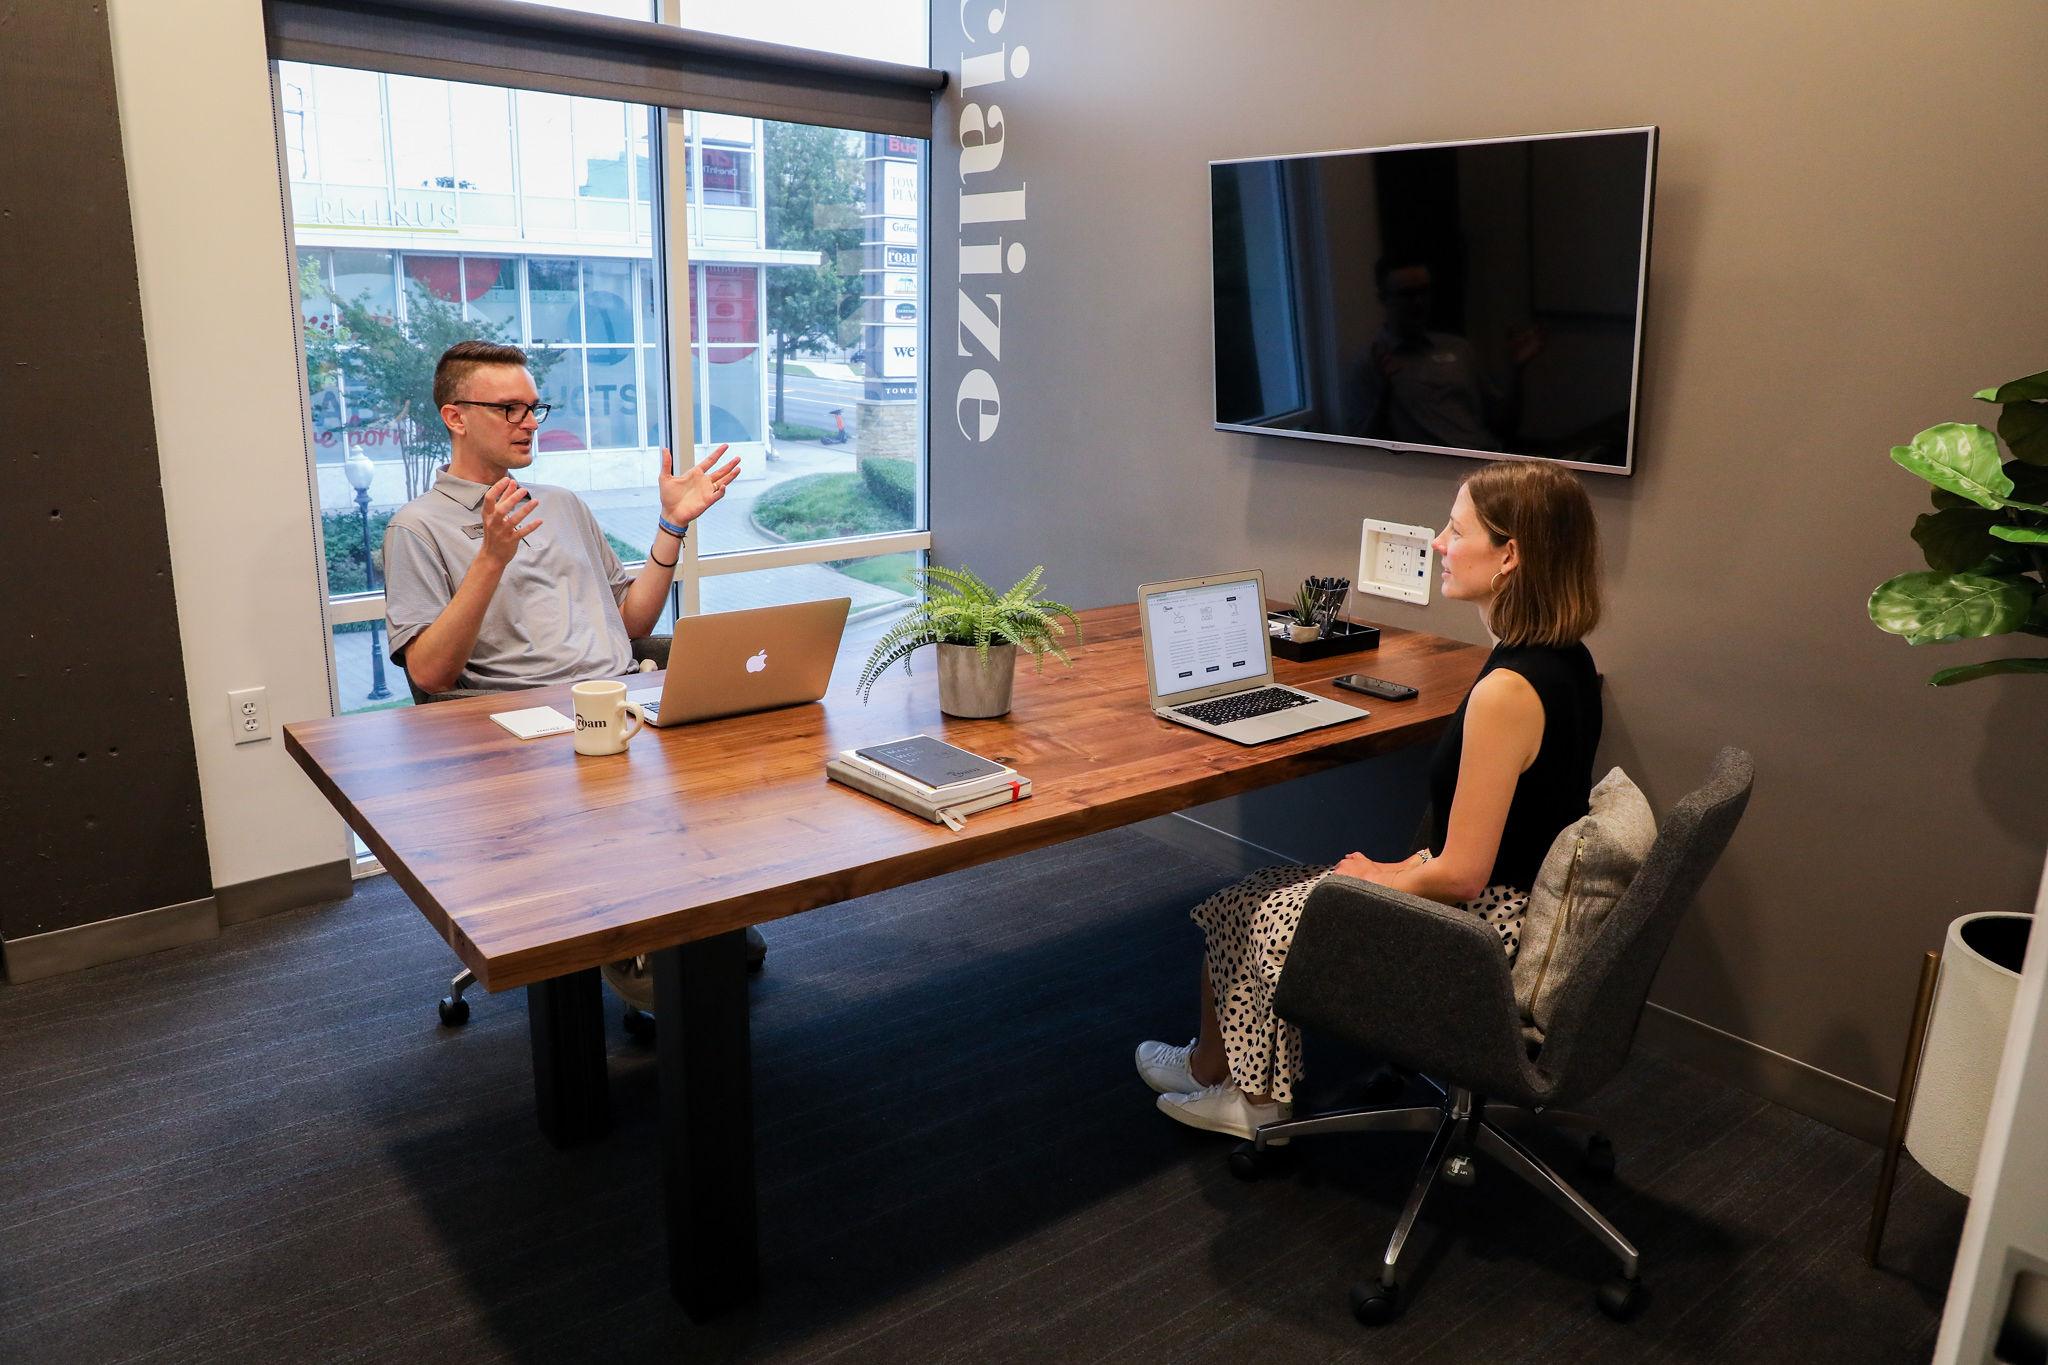 Team meeting in Buckhead office with windows